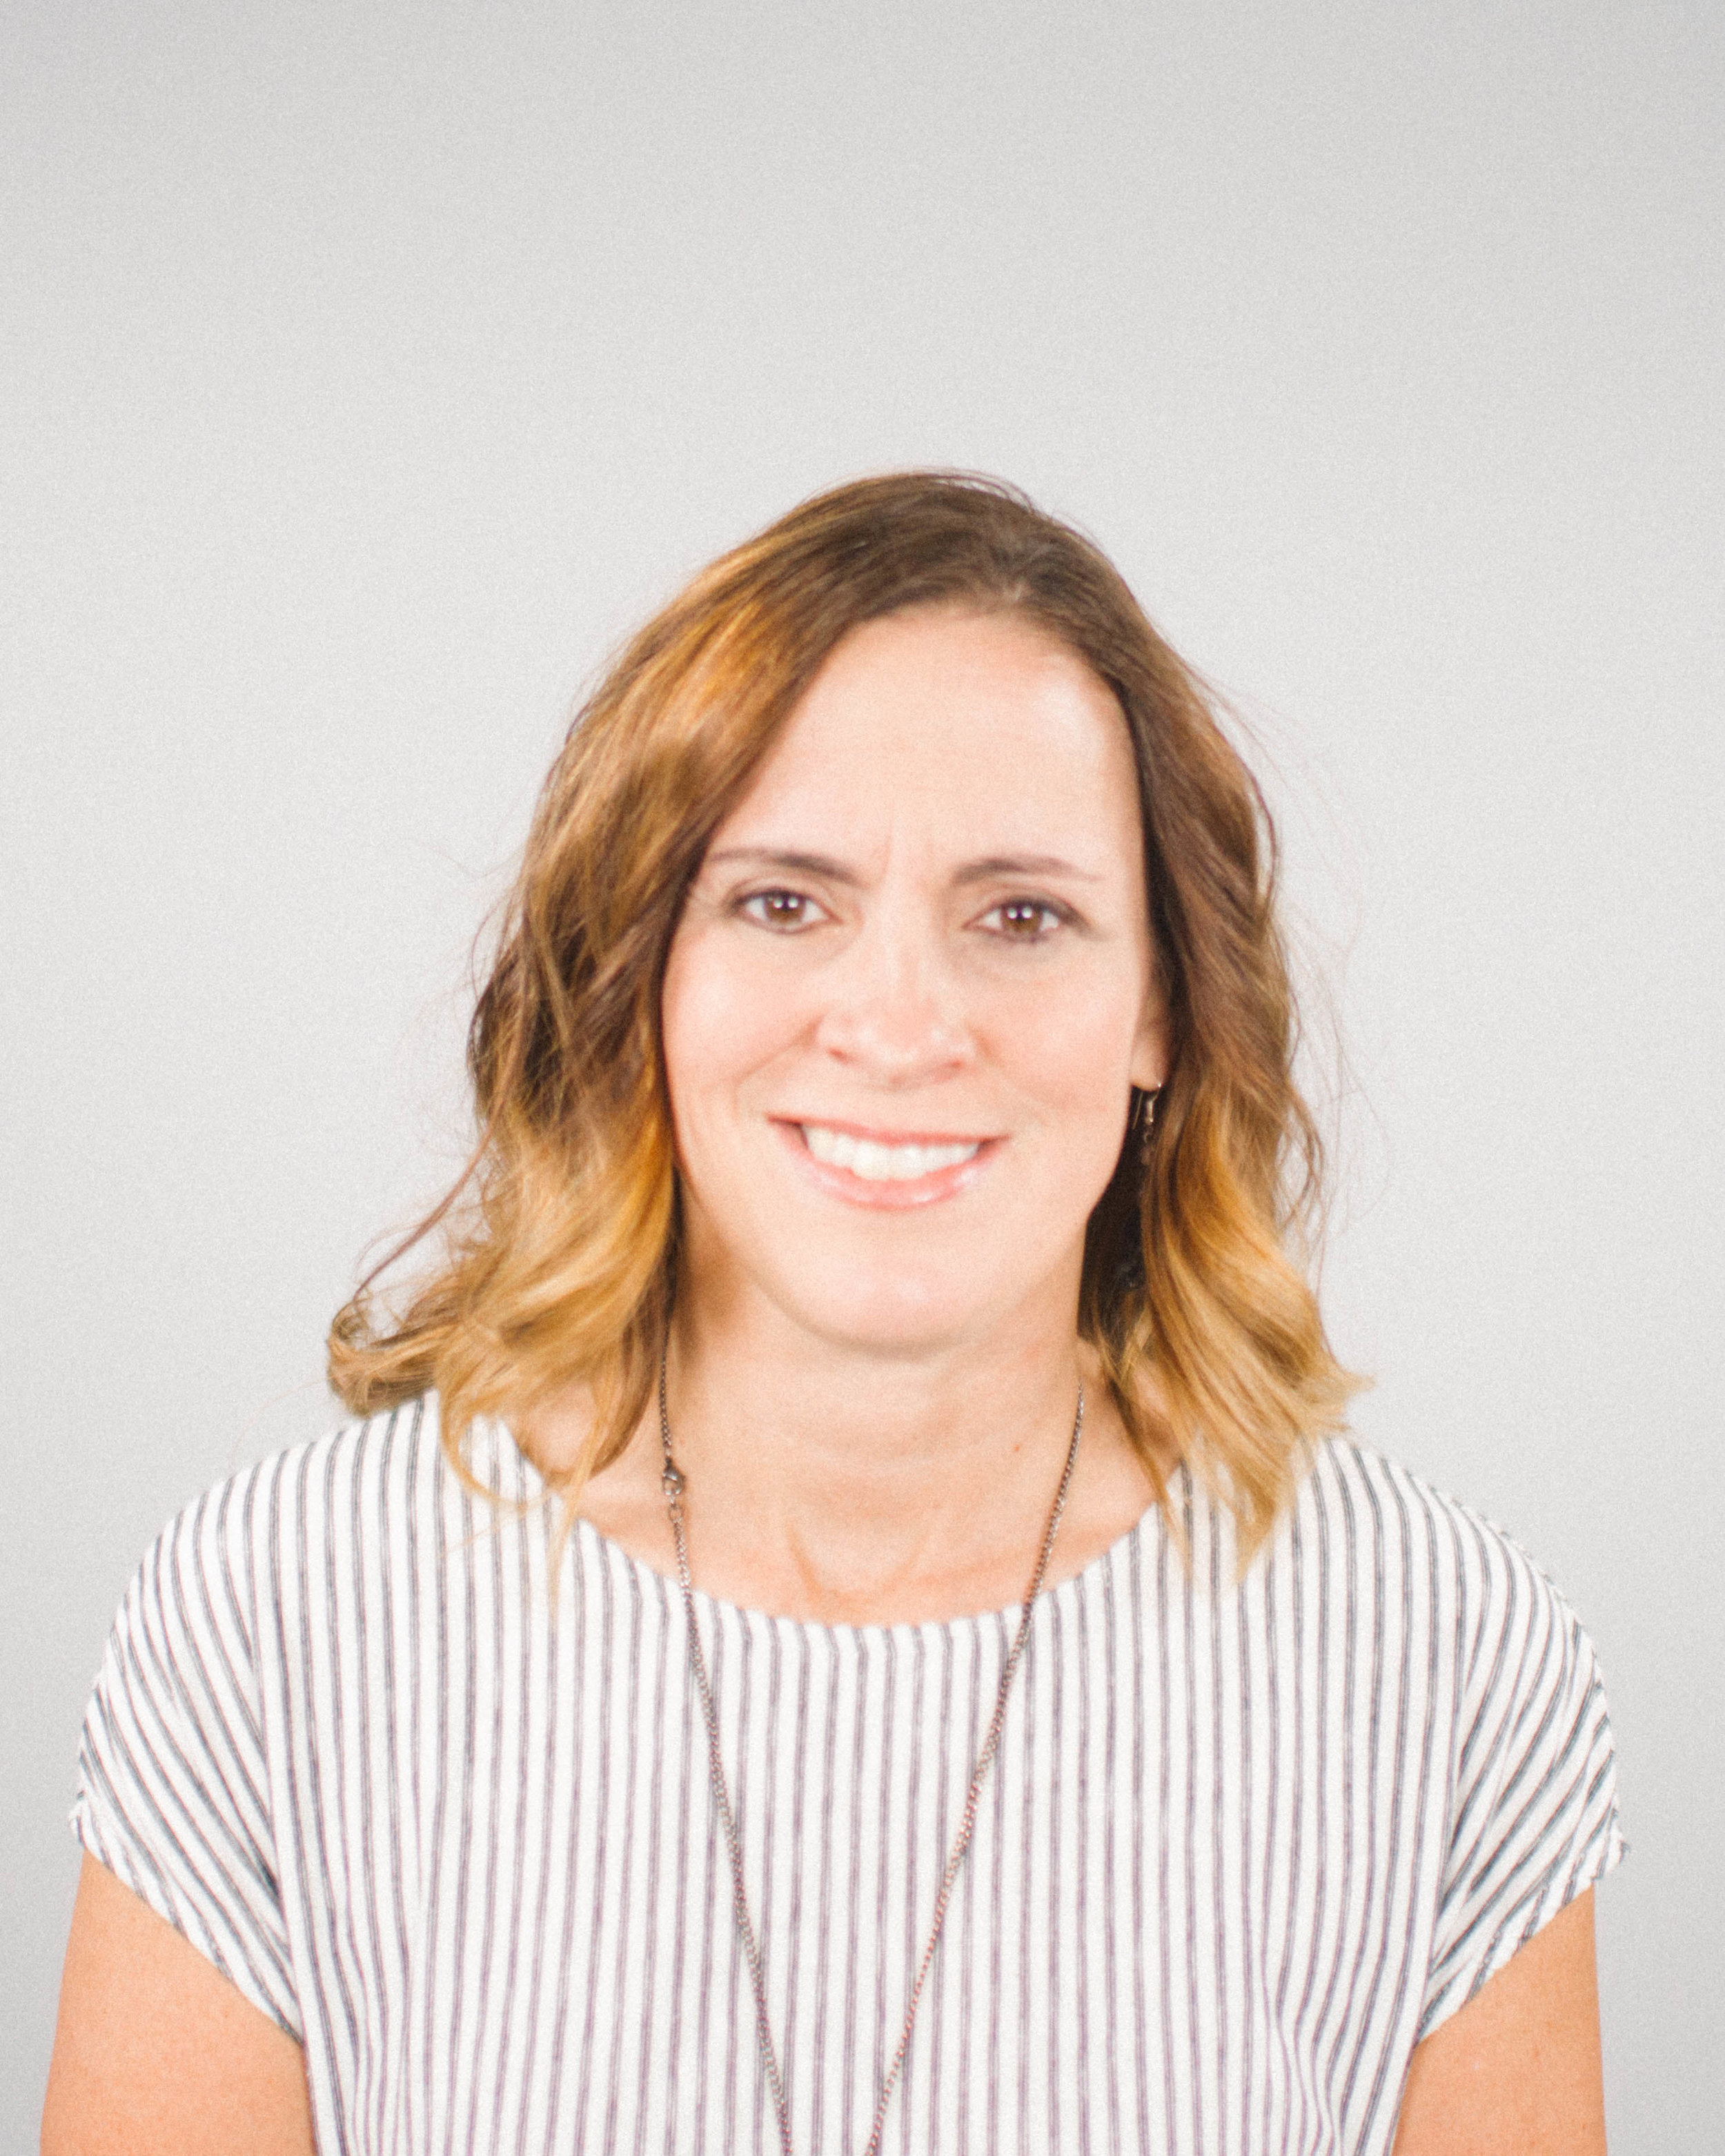 Jodi Ruch - Board Member